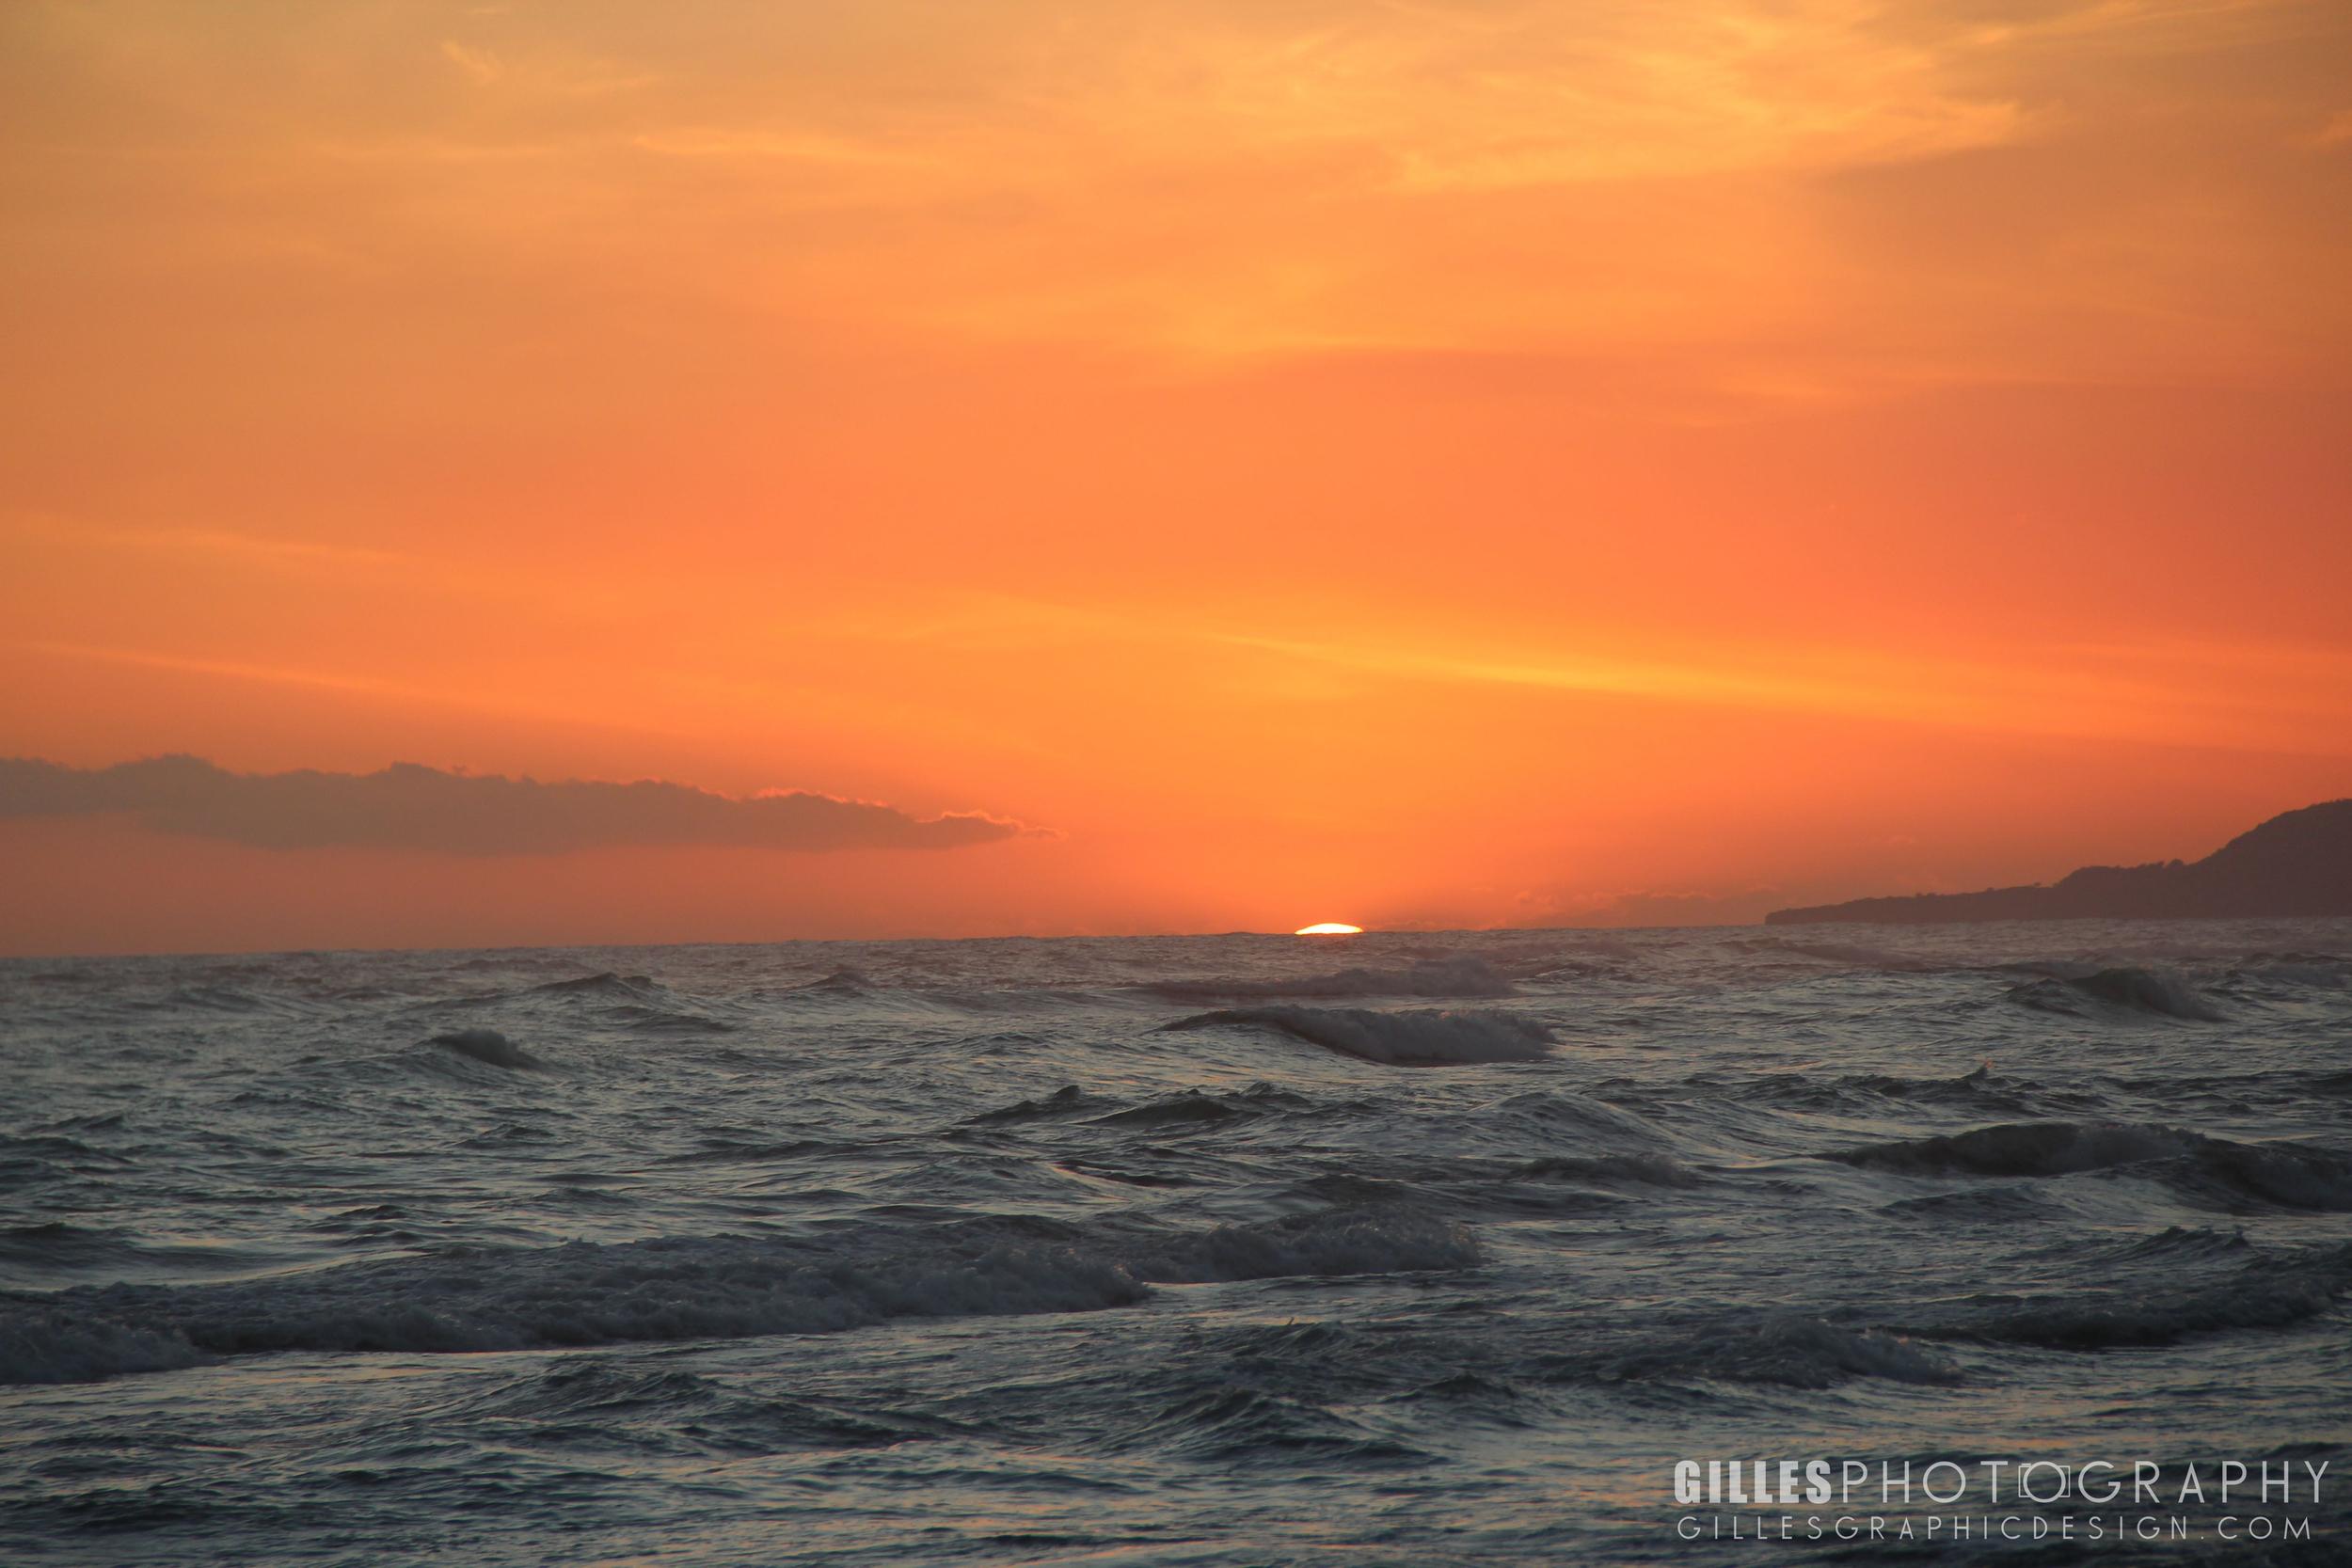 Sunset at Jacmel Beach